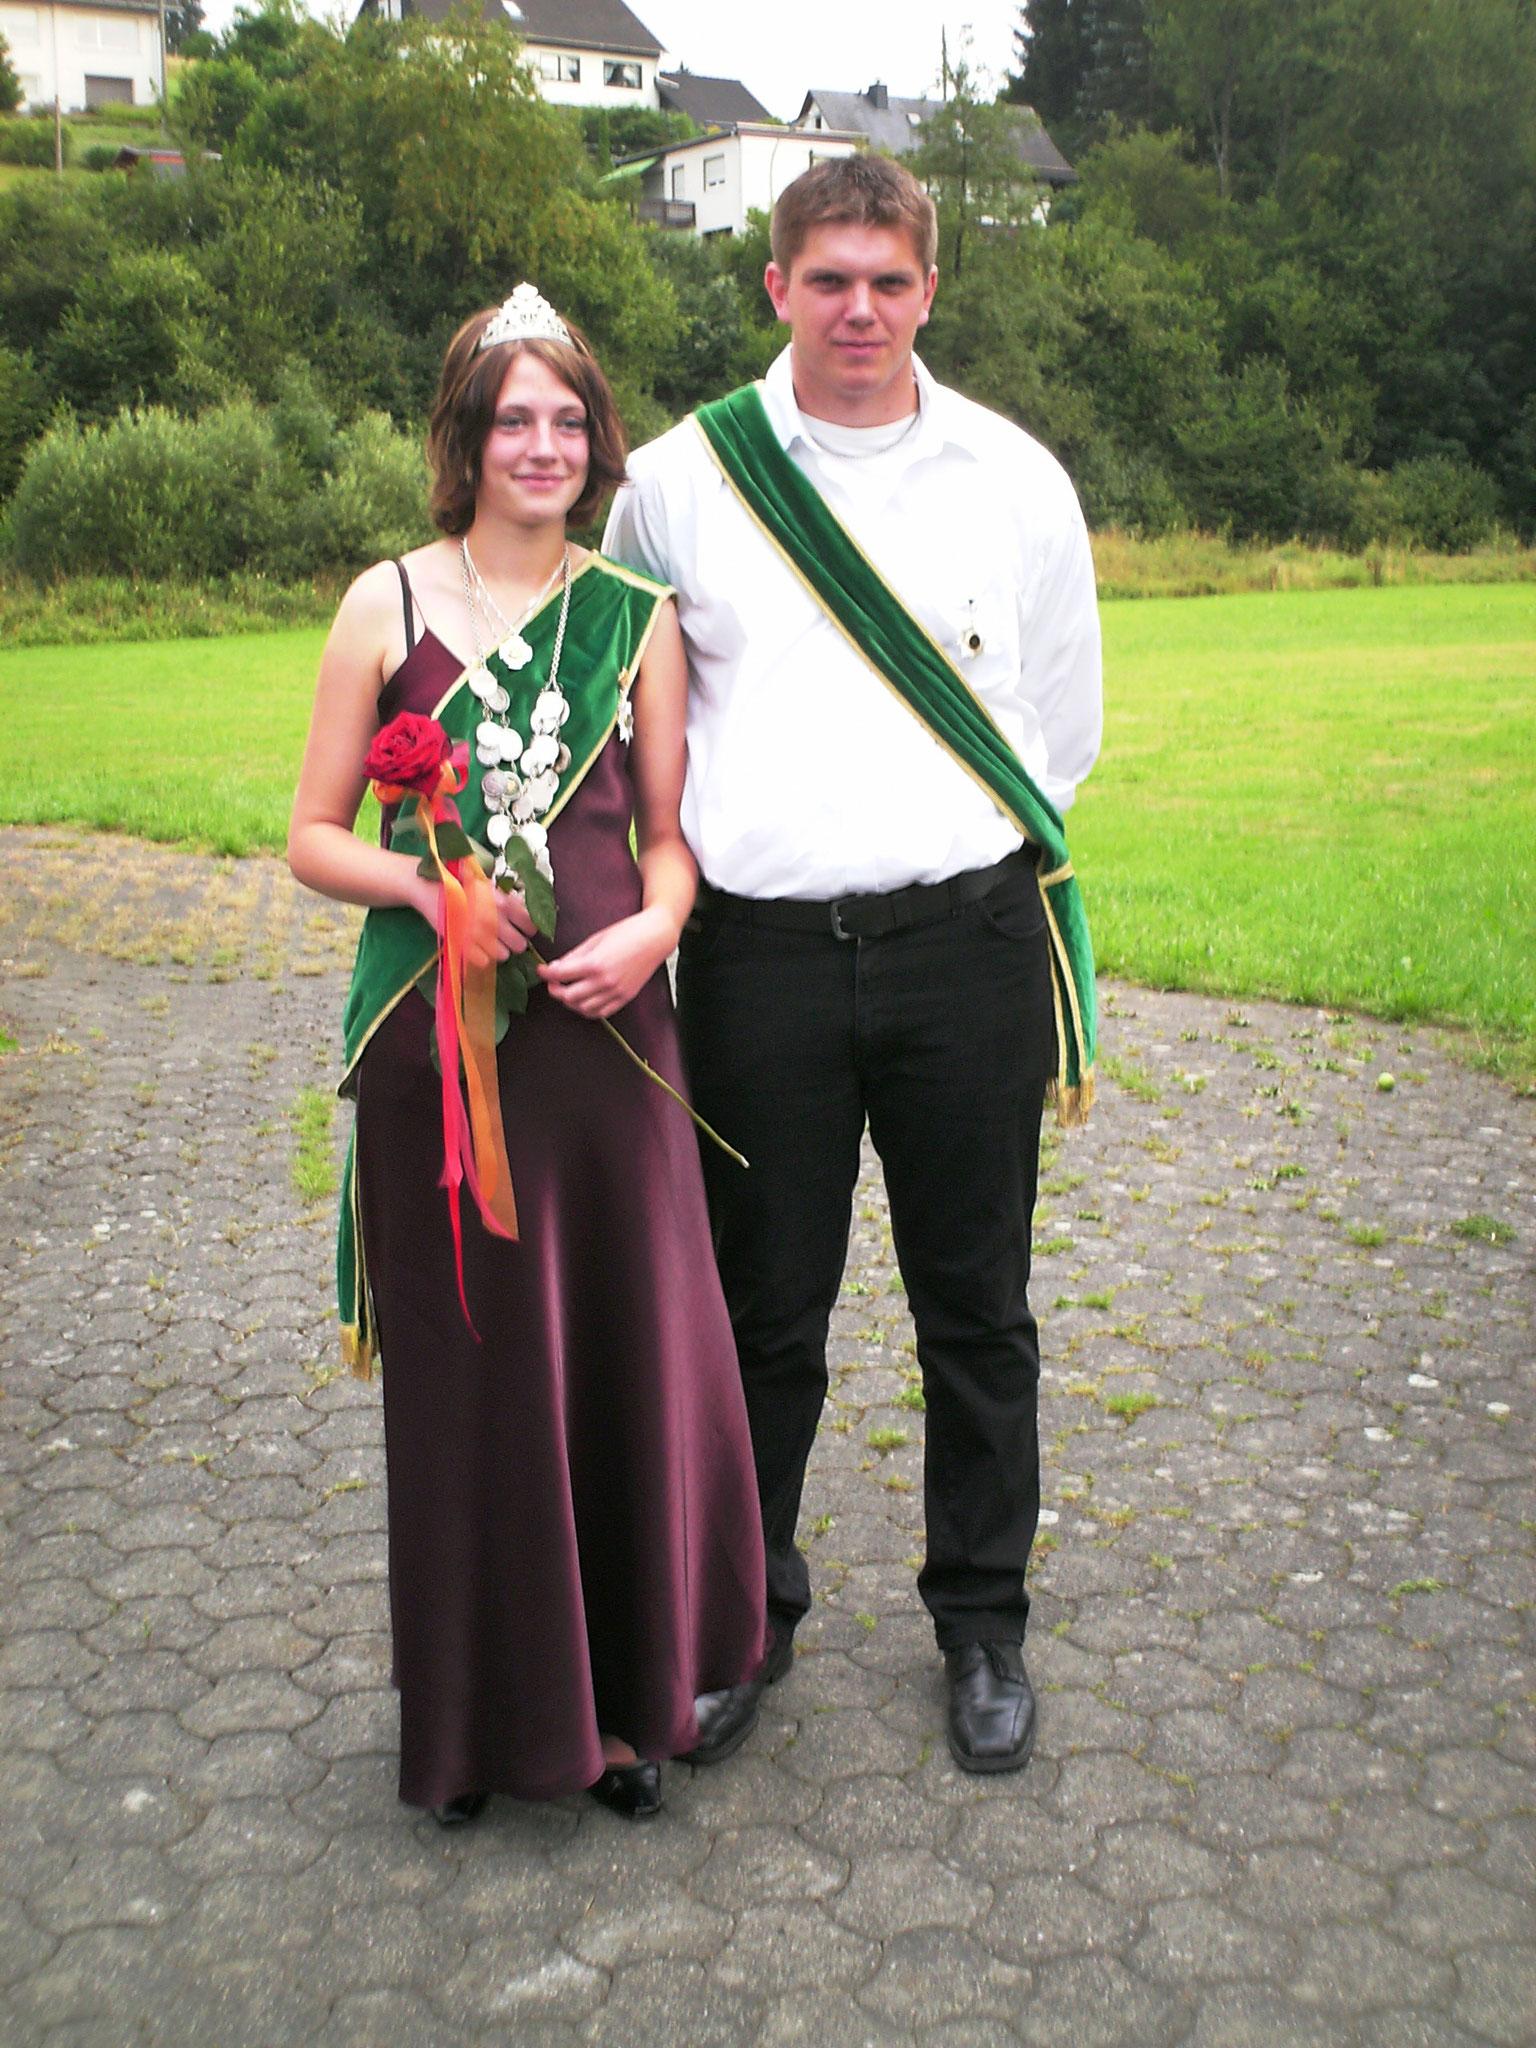 Jungschützenkönigspaar 2006: Angela Kufner und Prinzregent Friedrich August Dörr